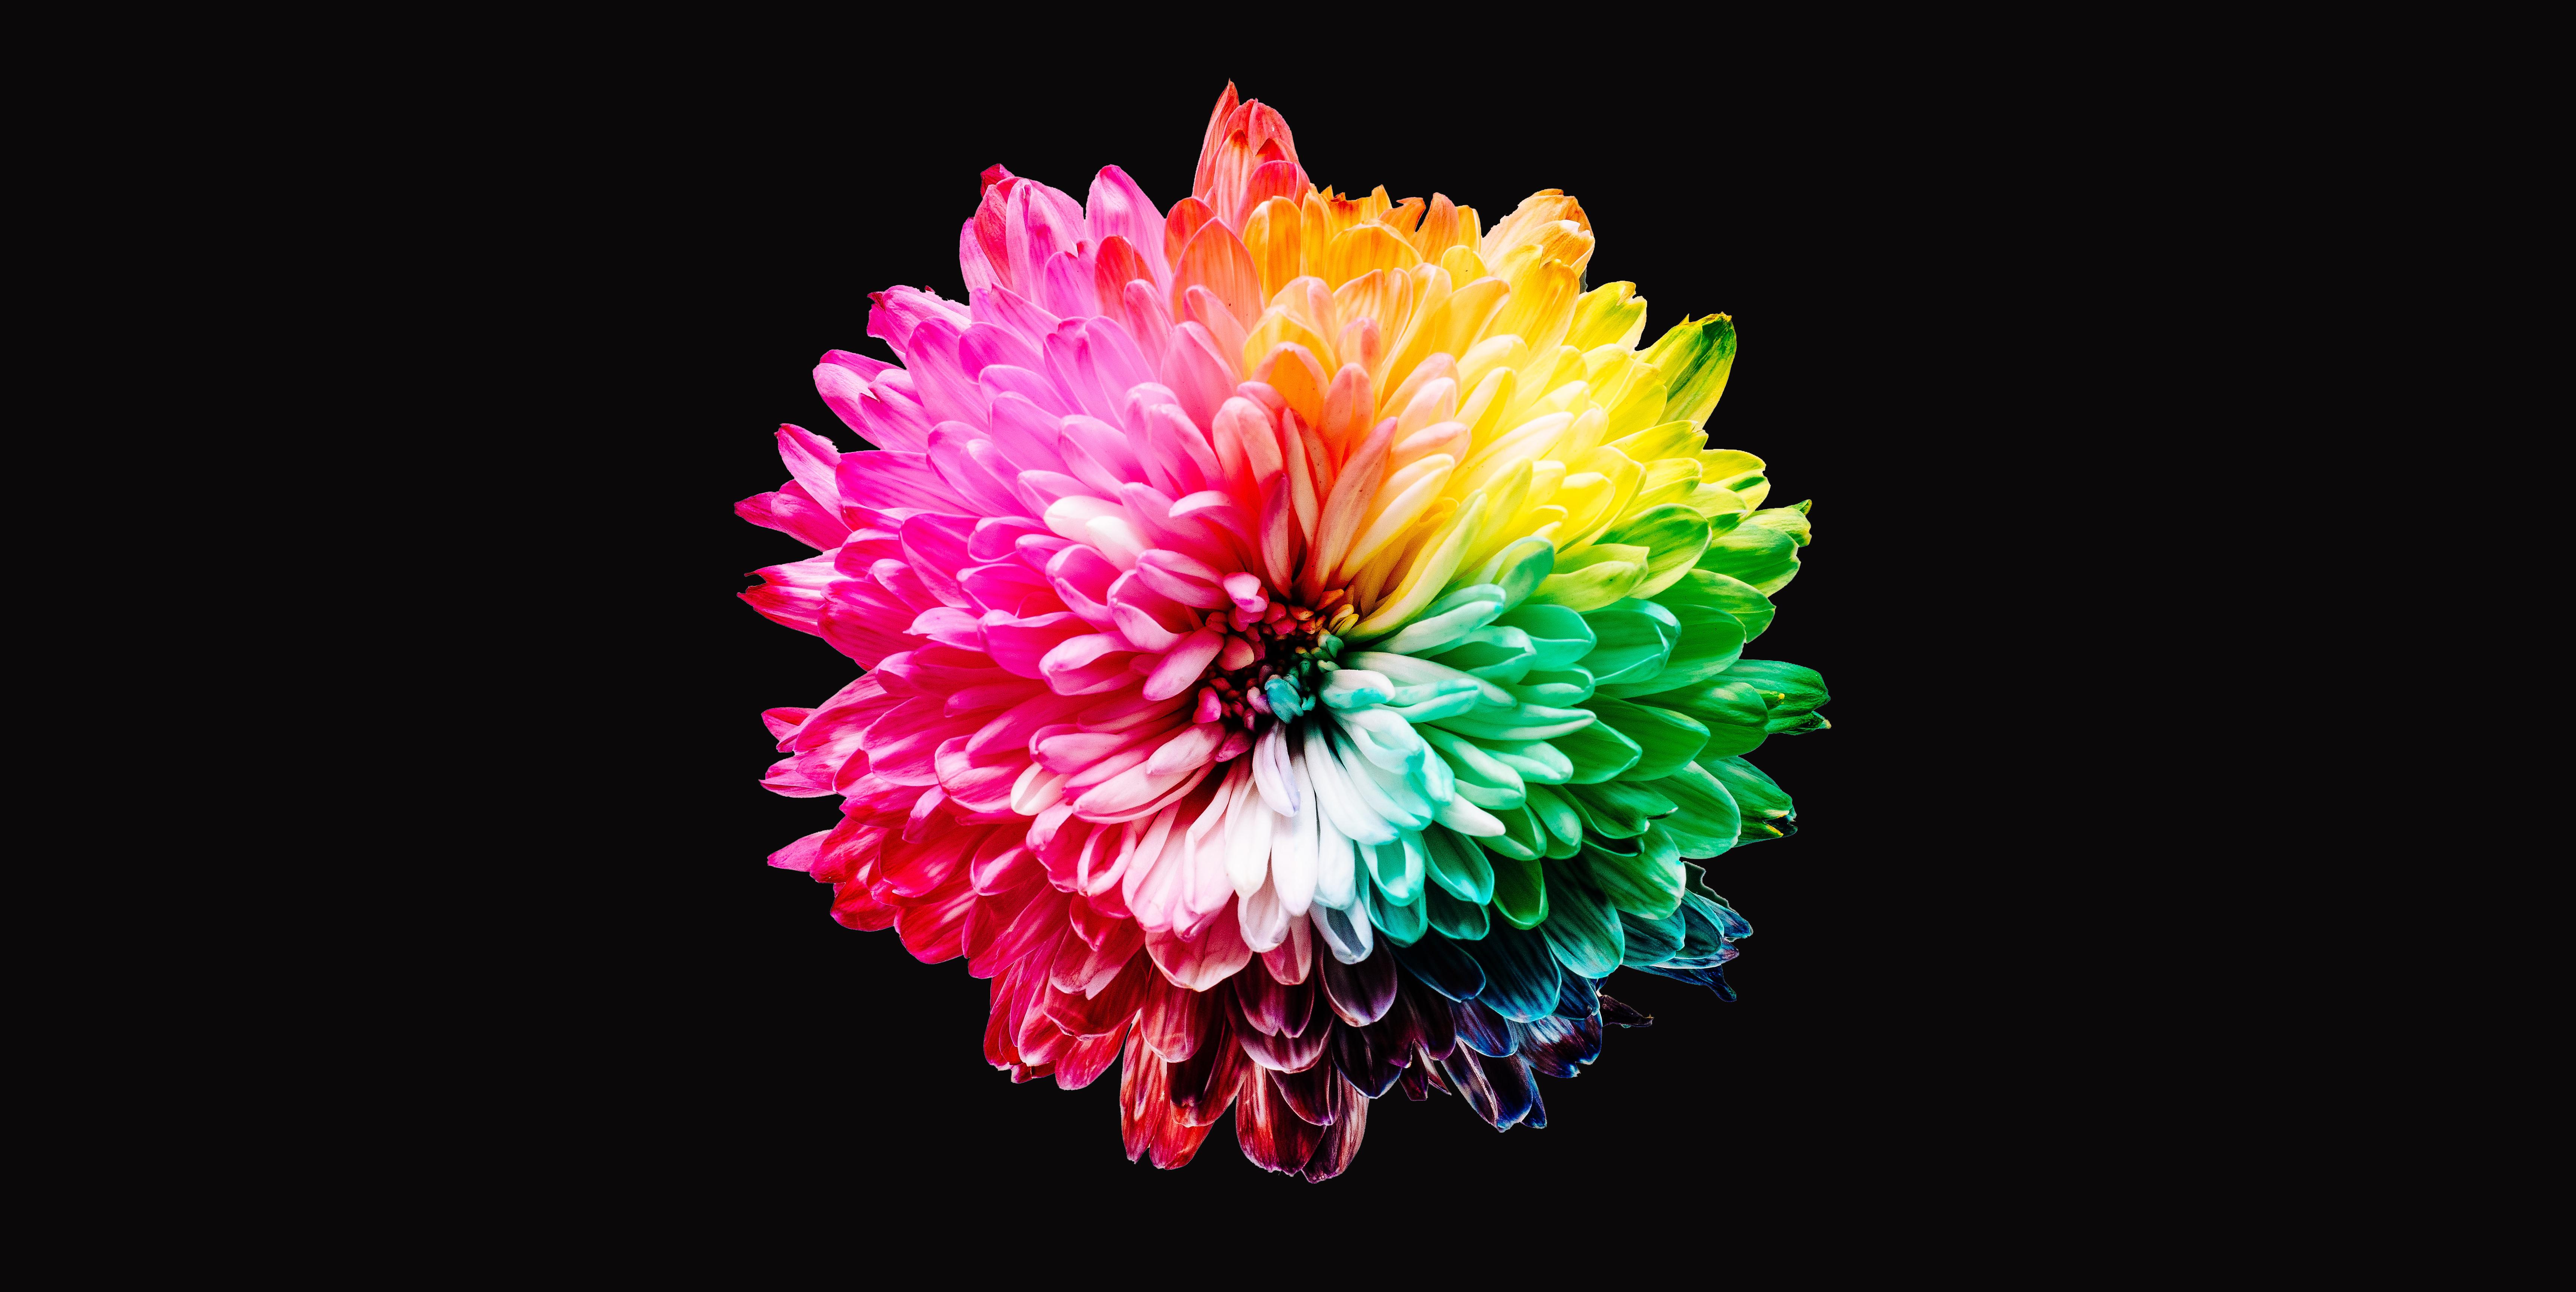 Colorful Flowers 4k Wallpaper Multicolor Black Background 5k Flowers 1258